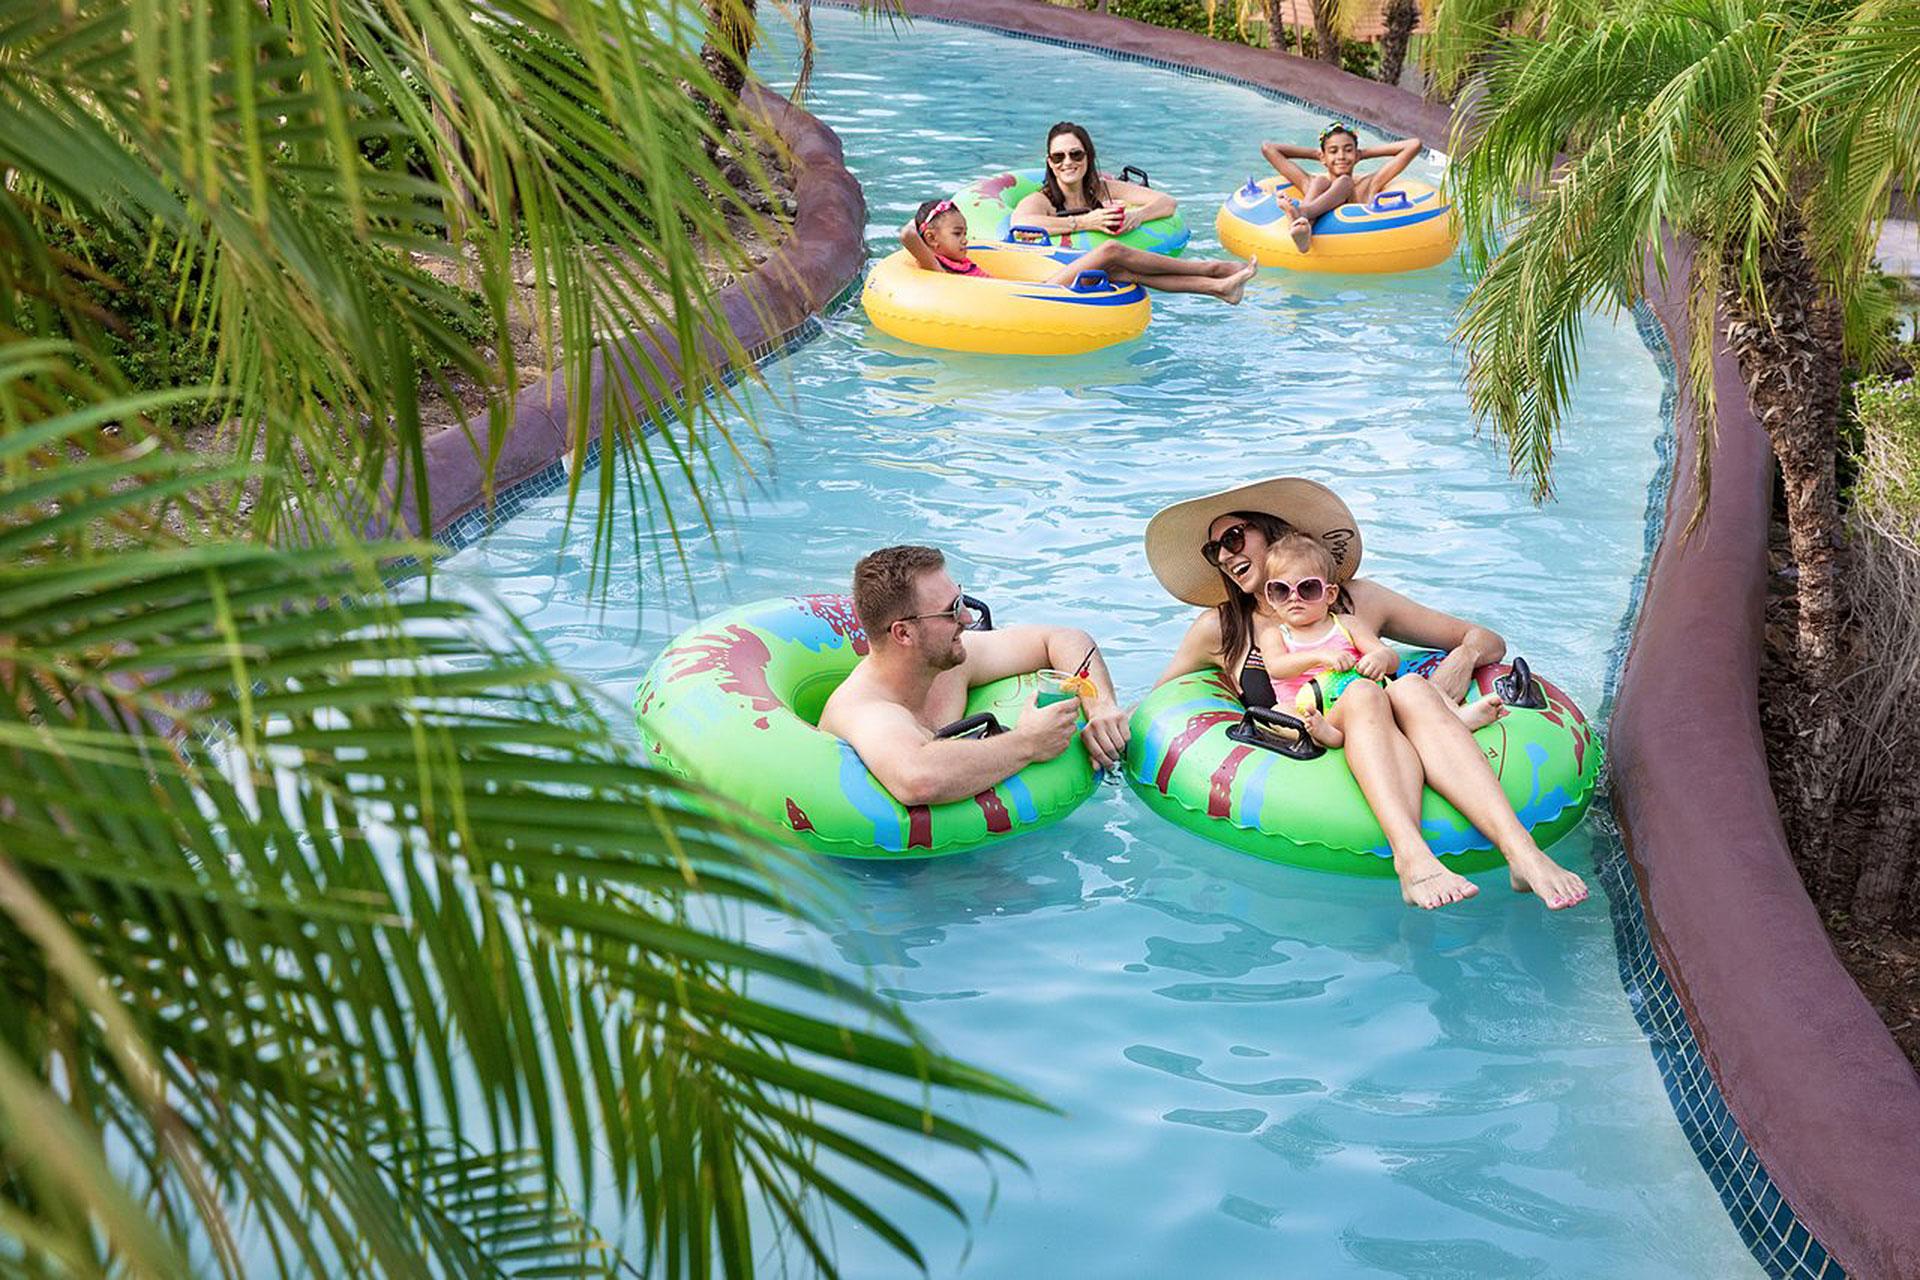 Slide Hilton Pointe Peak Water Squaw Resort